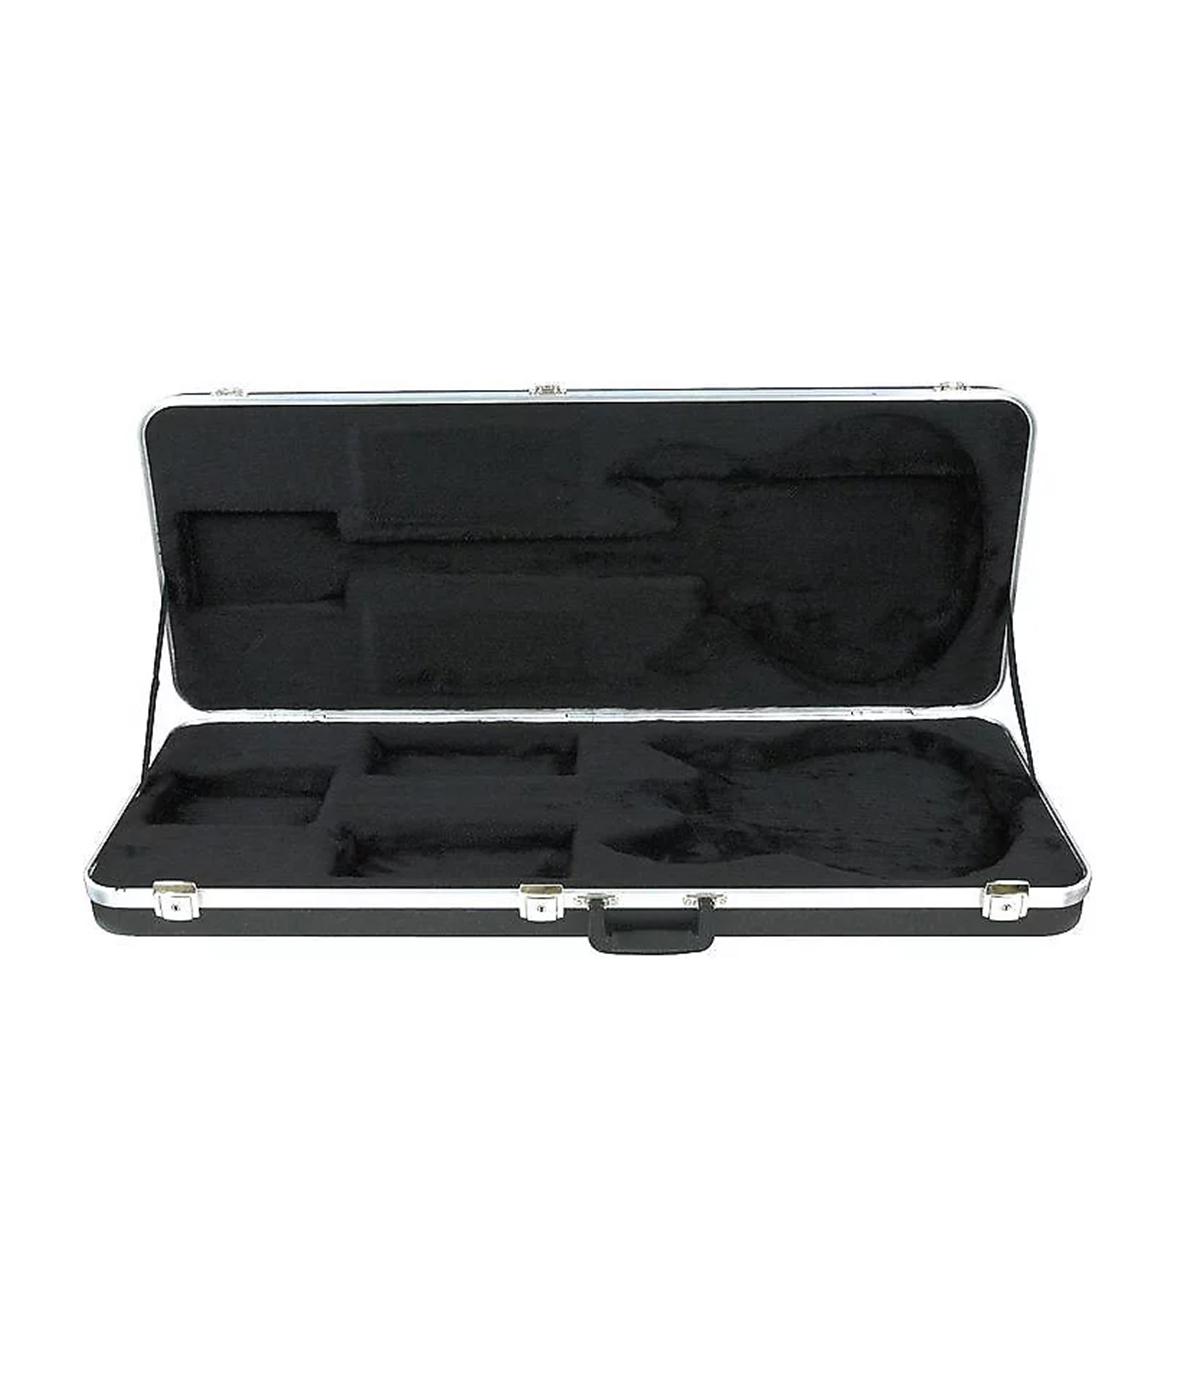 CASE RICKENBACKER 94021 330/360 STD